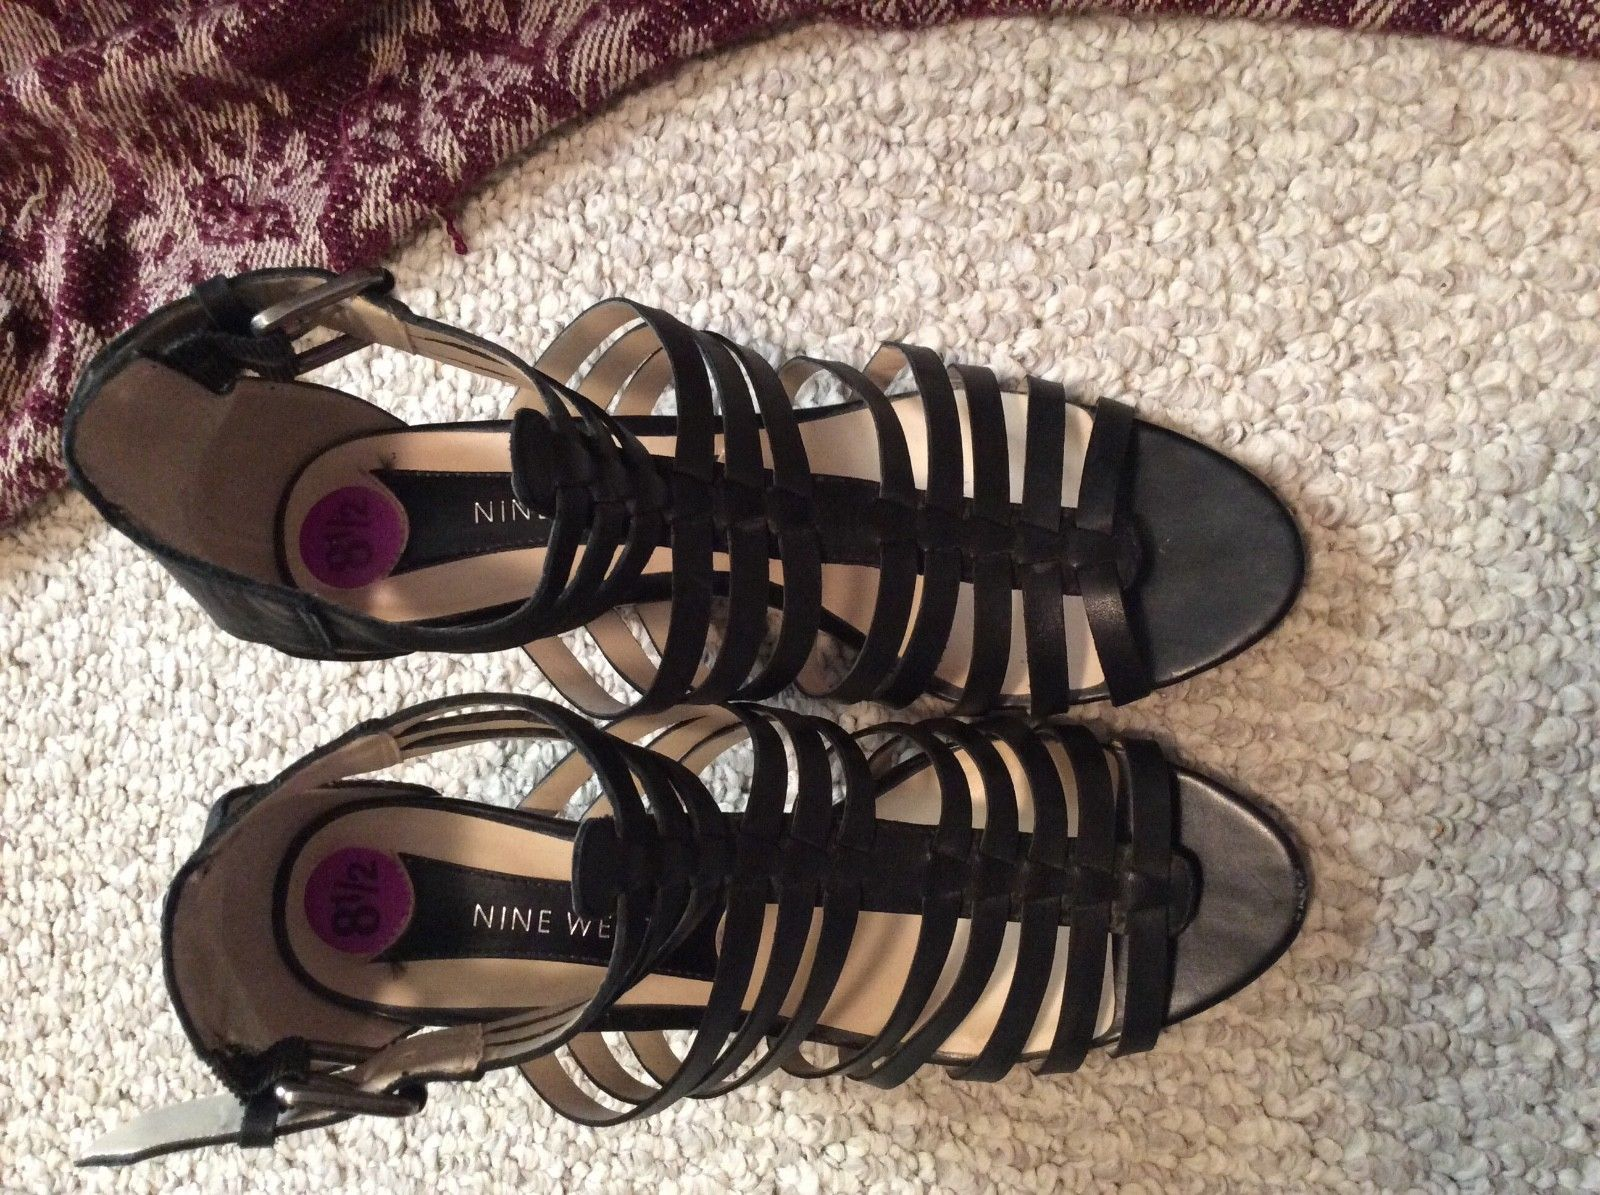 Womens 8.5 8 1/2 NINE WEST Blk Leather Hi Heel shoes Strappy Sandals CUTE! EUC